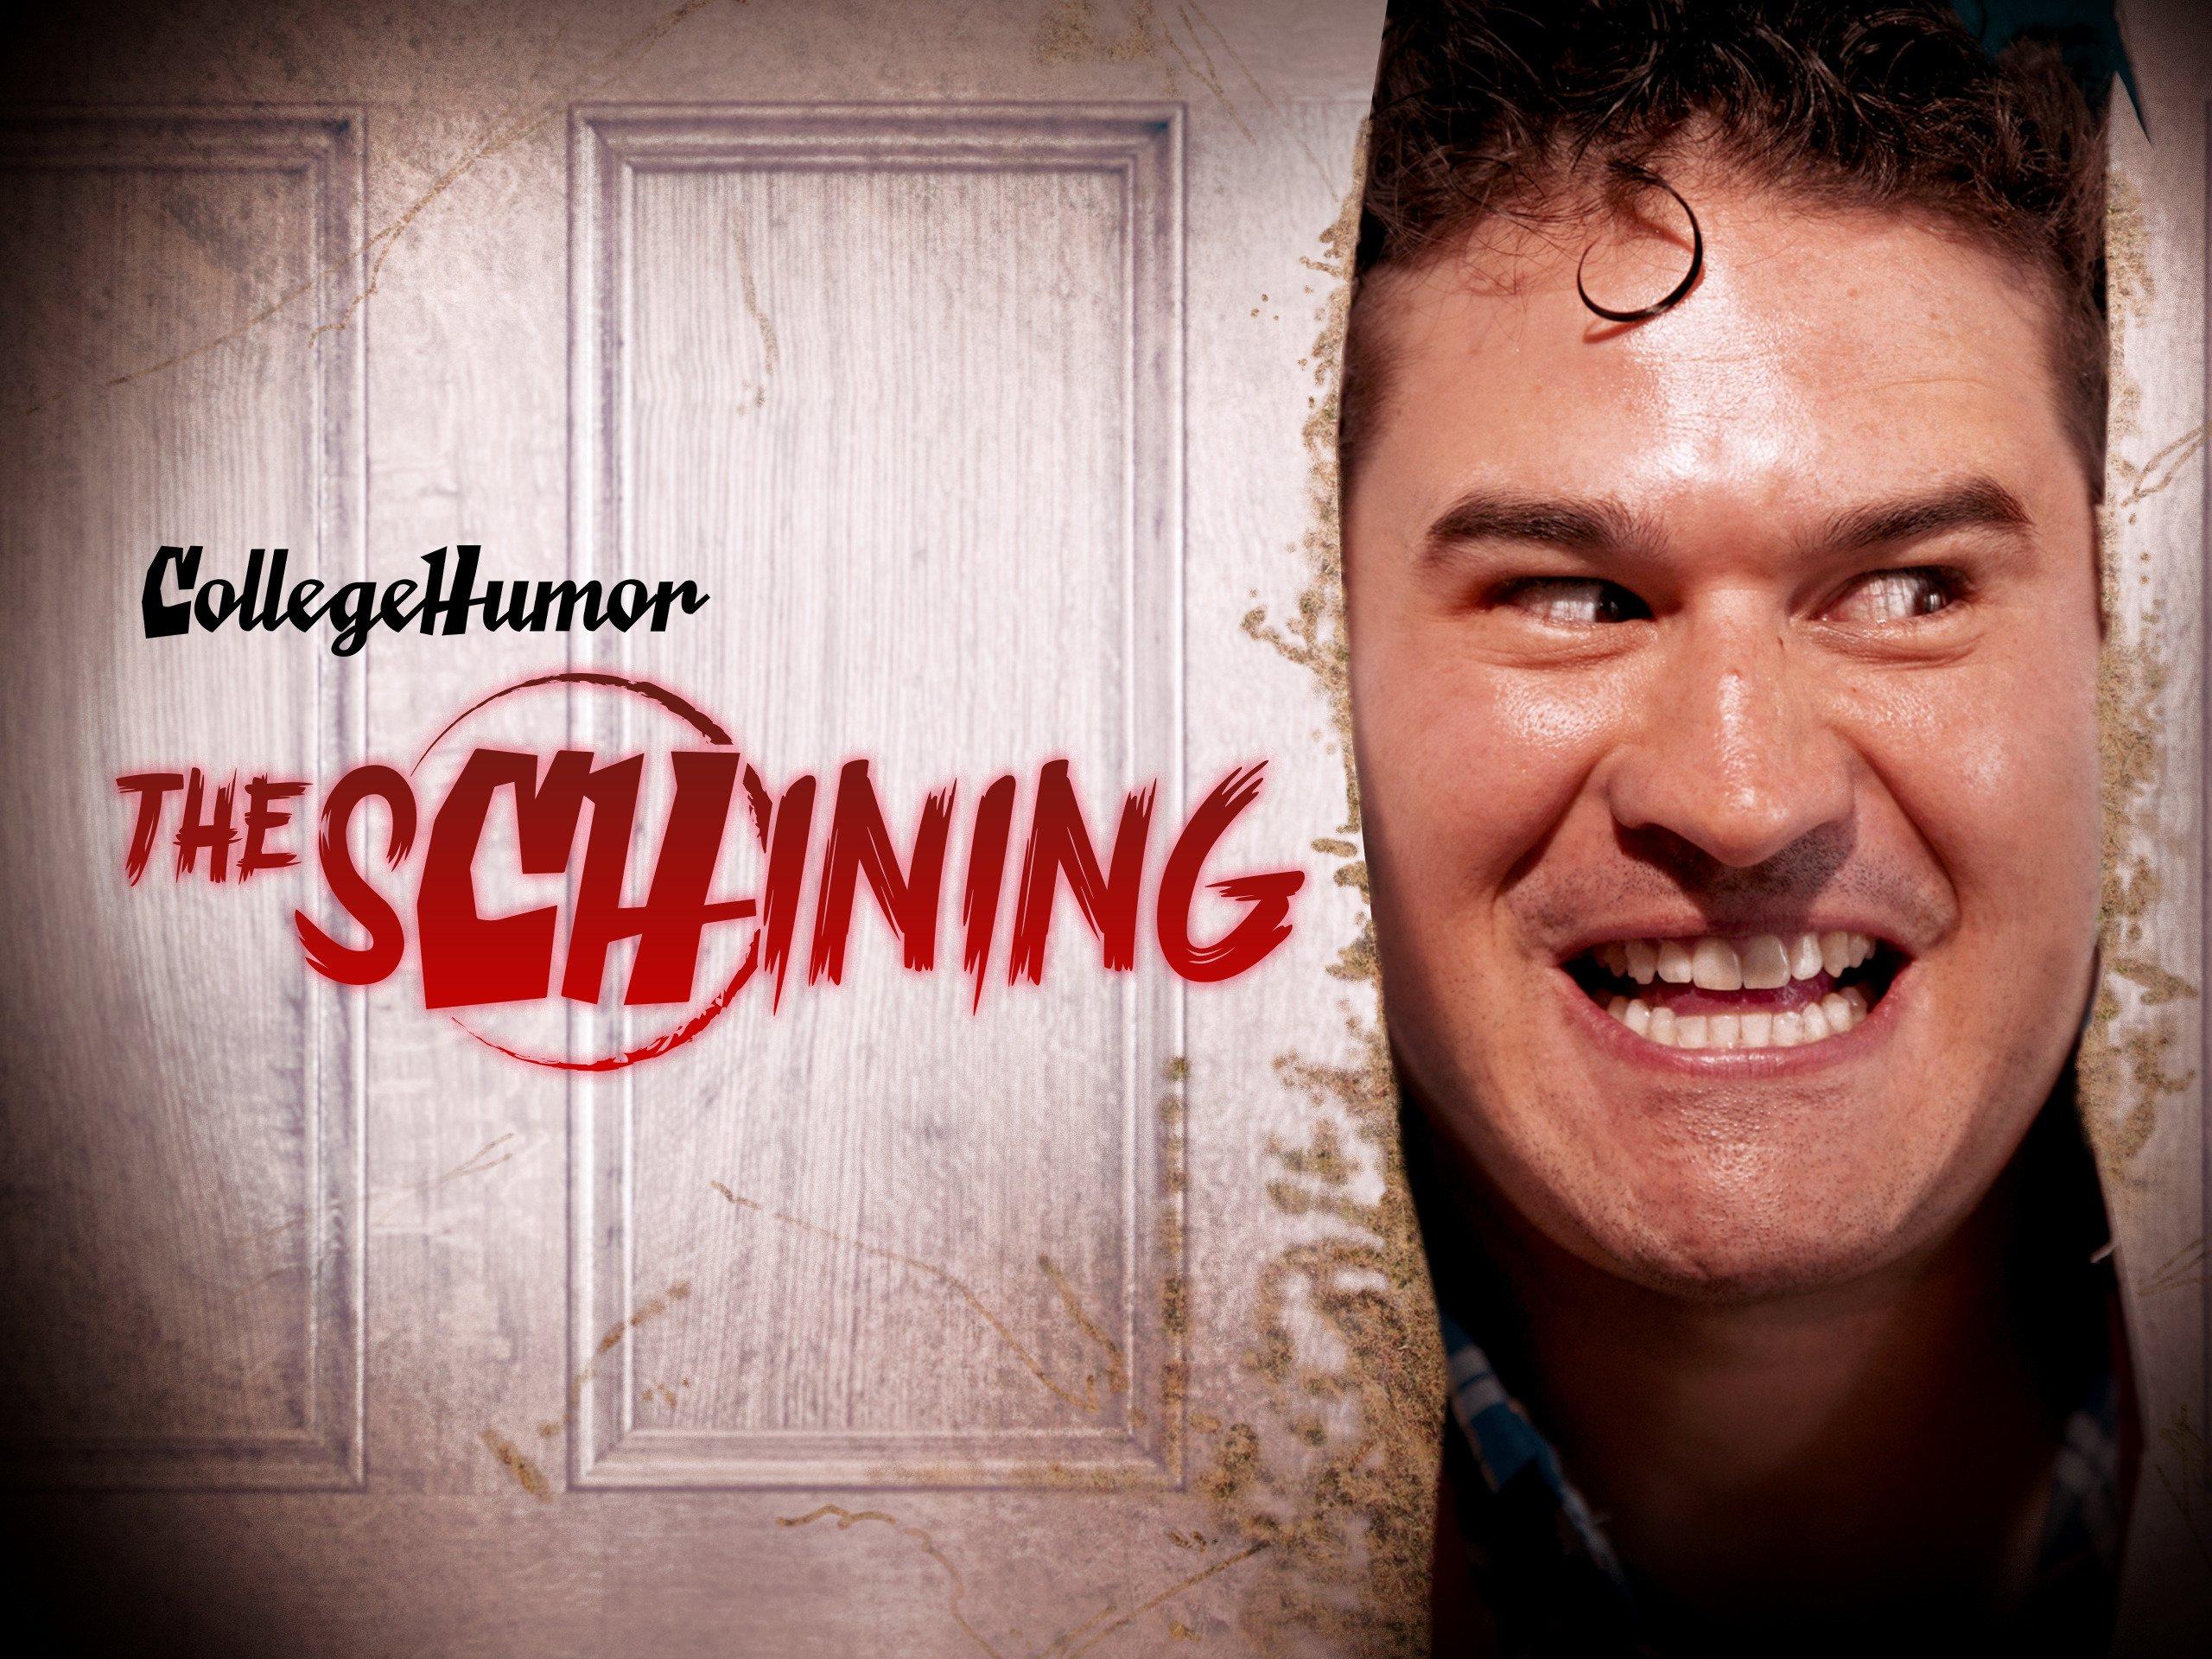 The sCHining - Season 1